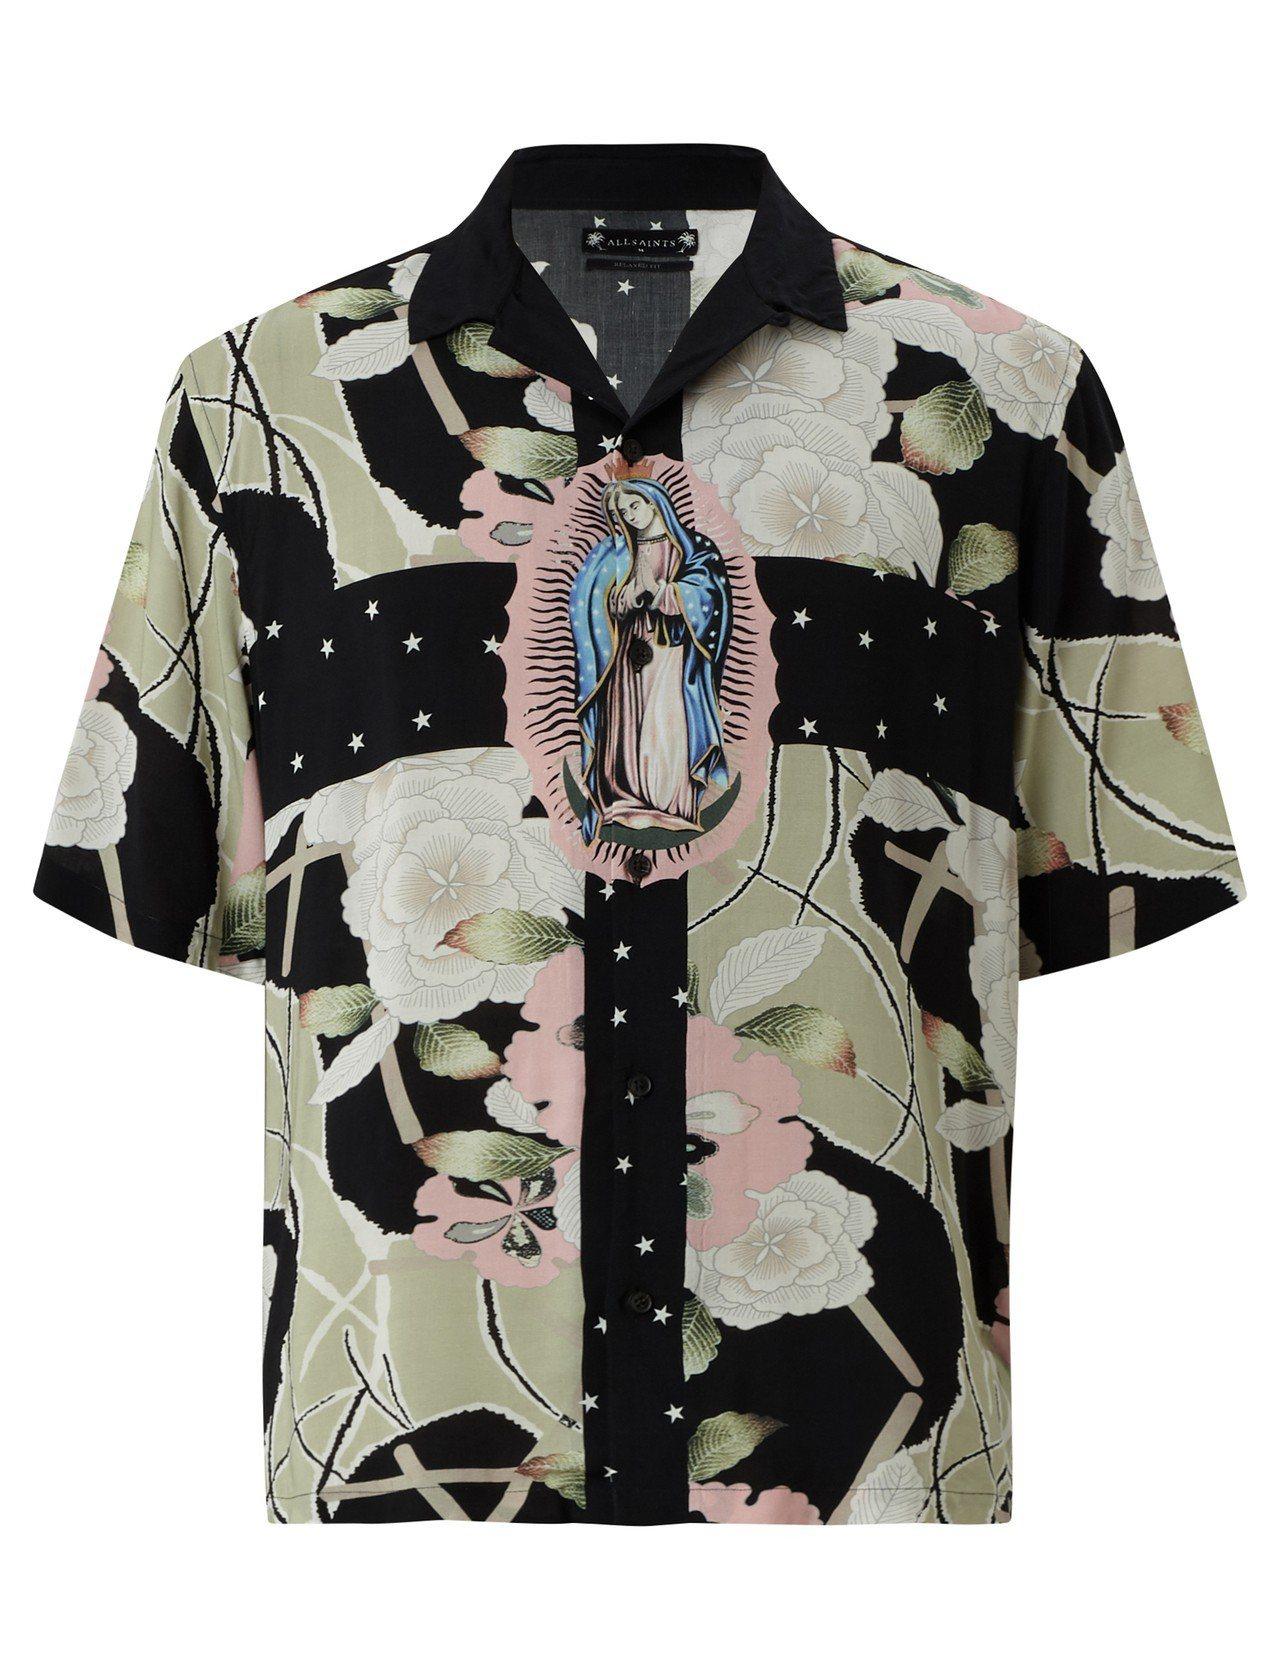 AllSaints Puerto印花襯衫4,400元。圖/AllSaints提供